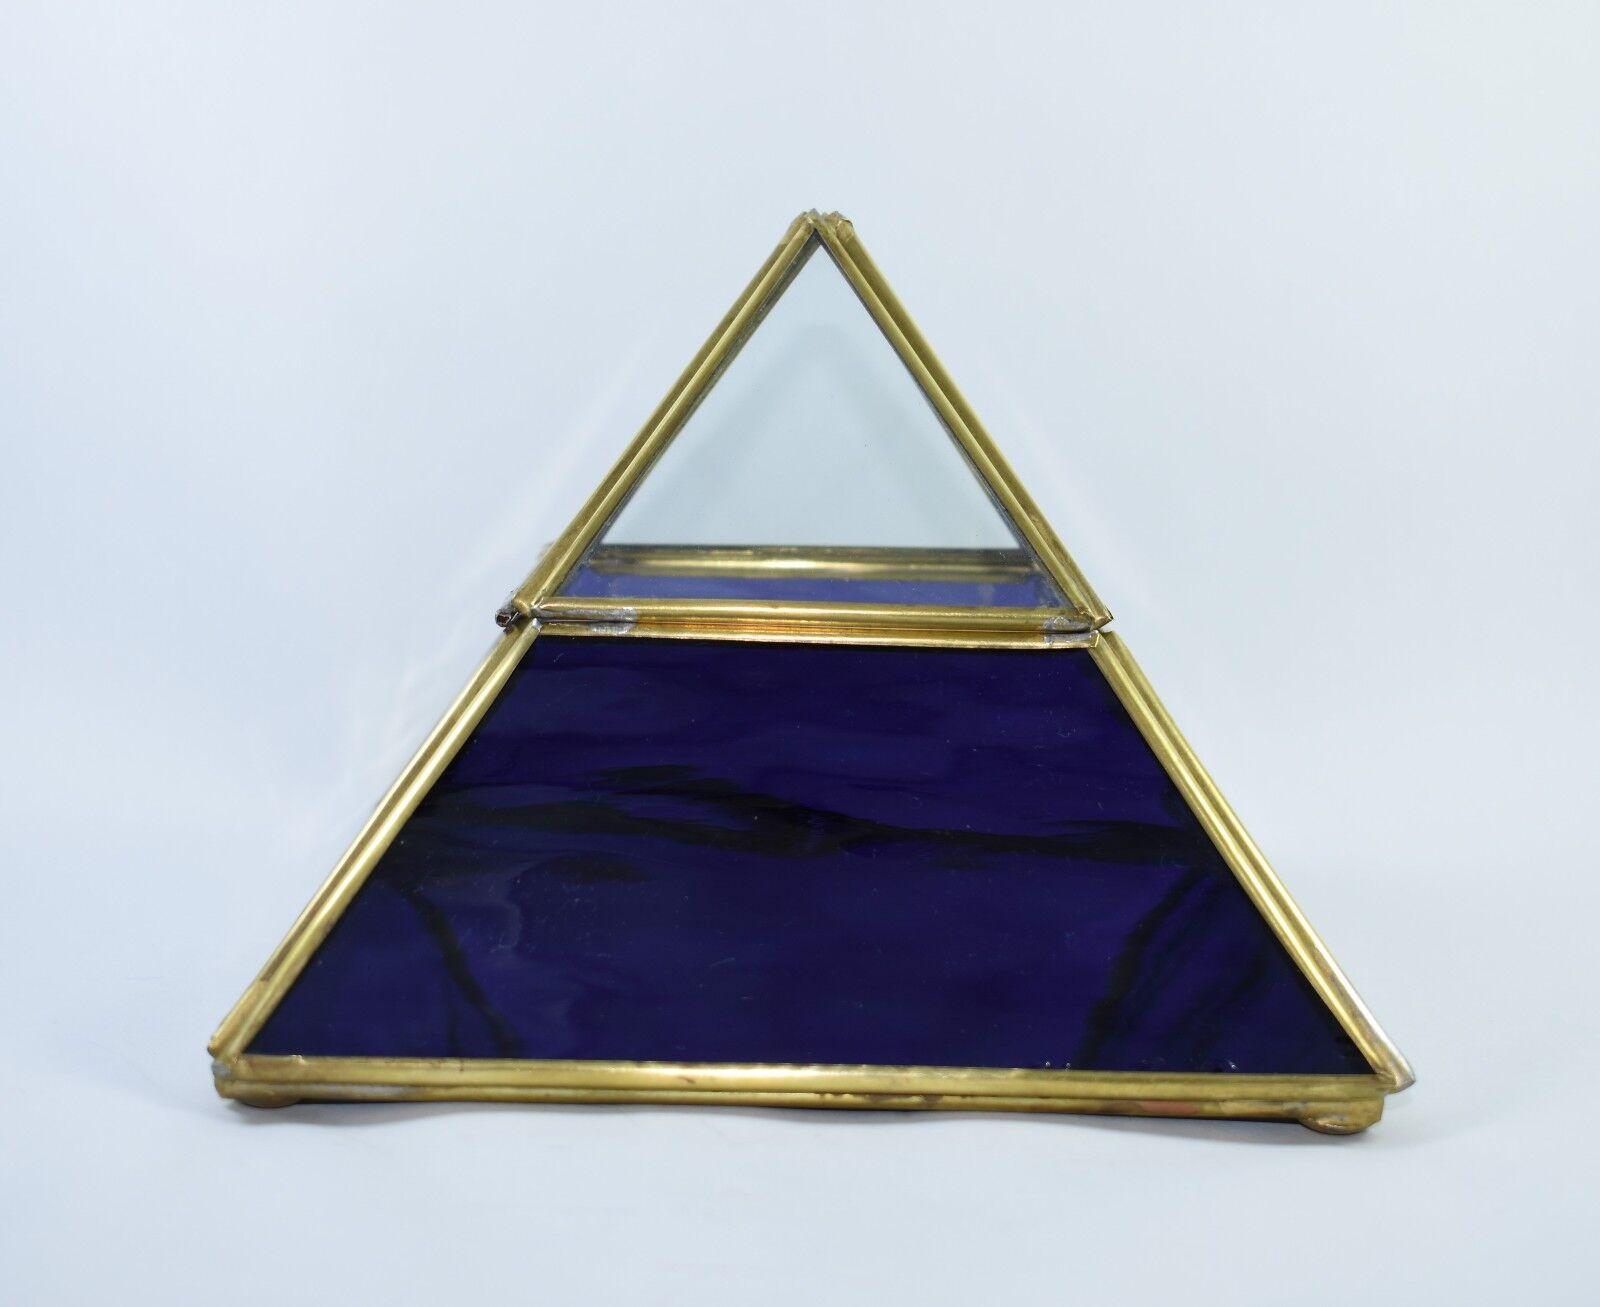 Handcrafted Purple Pyramid Curio Cabinet Collectible Collectible Collectible Glass Display Case 622806